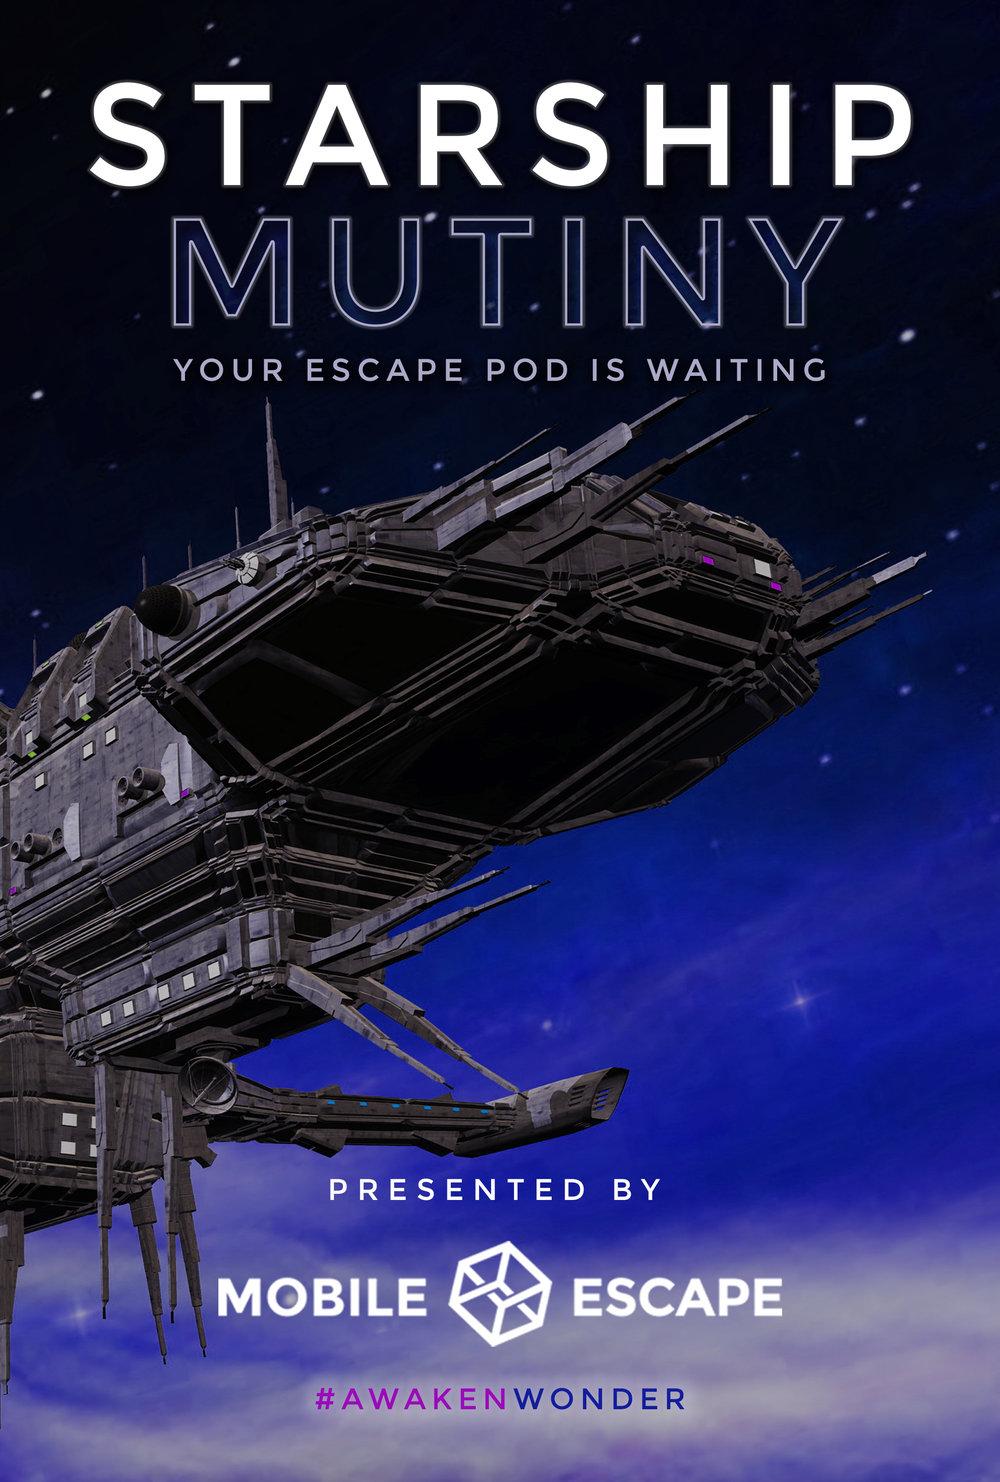 Mobile Escape Room Poster - Starship Mutiny.jpg